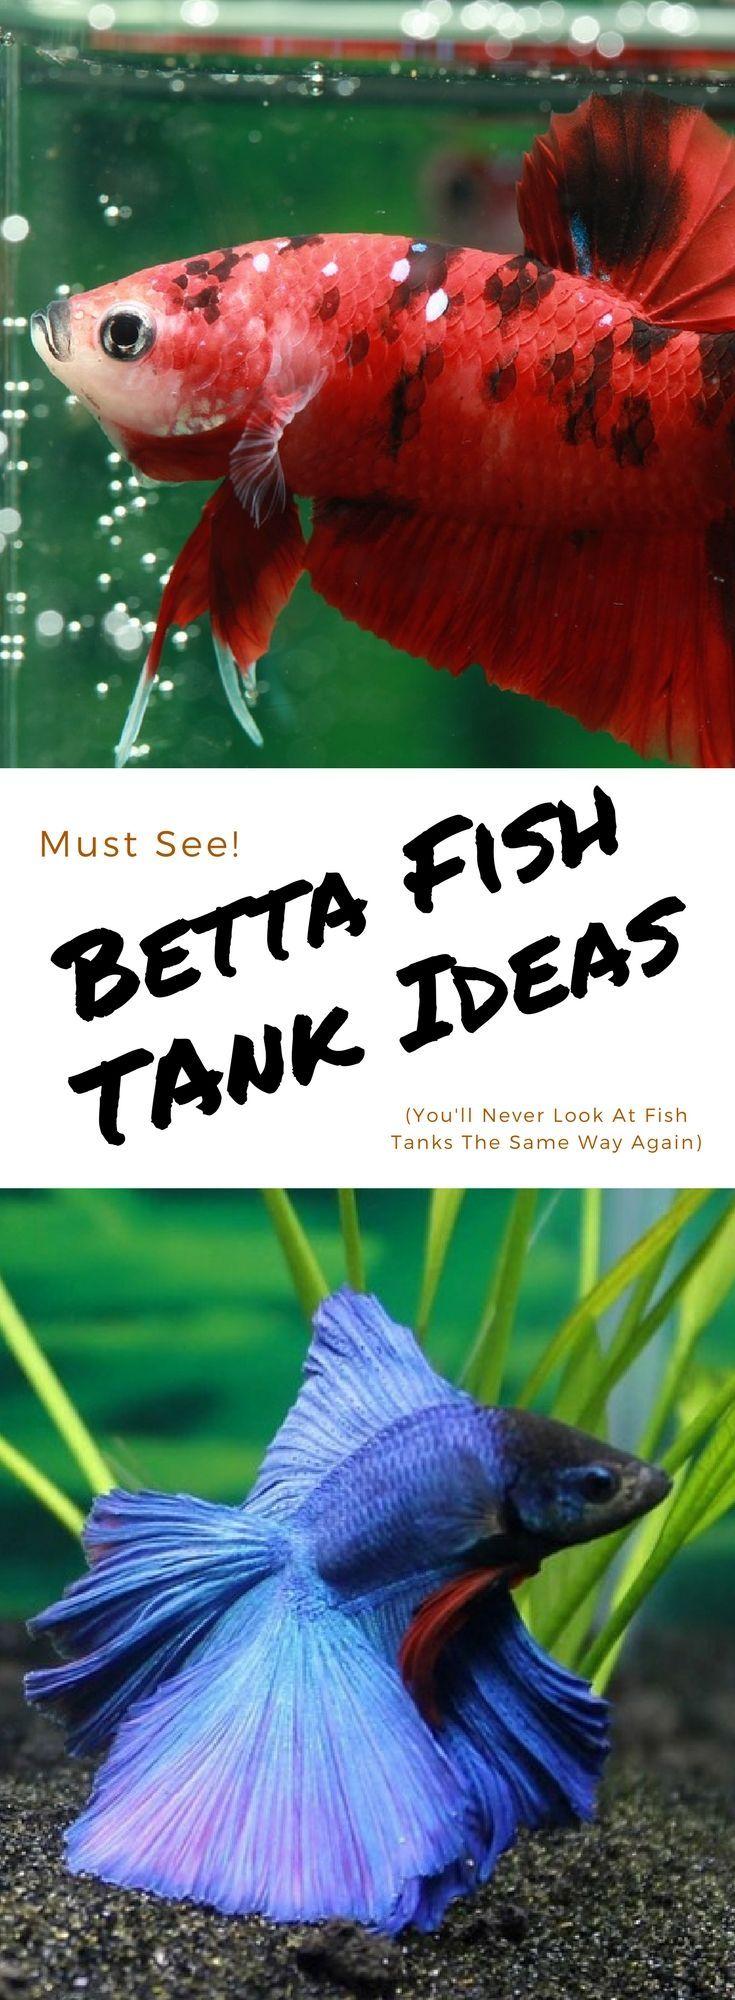 13850 best Betta fish tank images on Pinterest | Fish aquariums ...